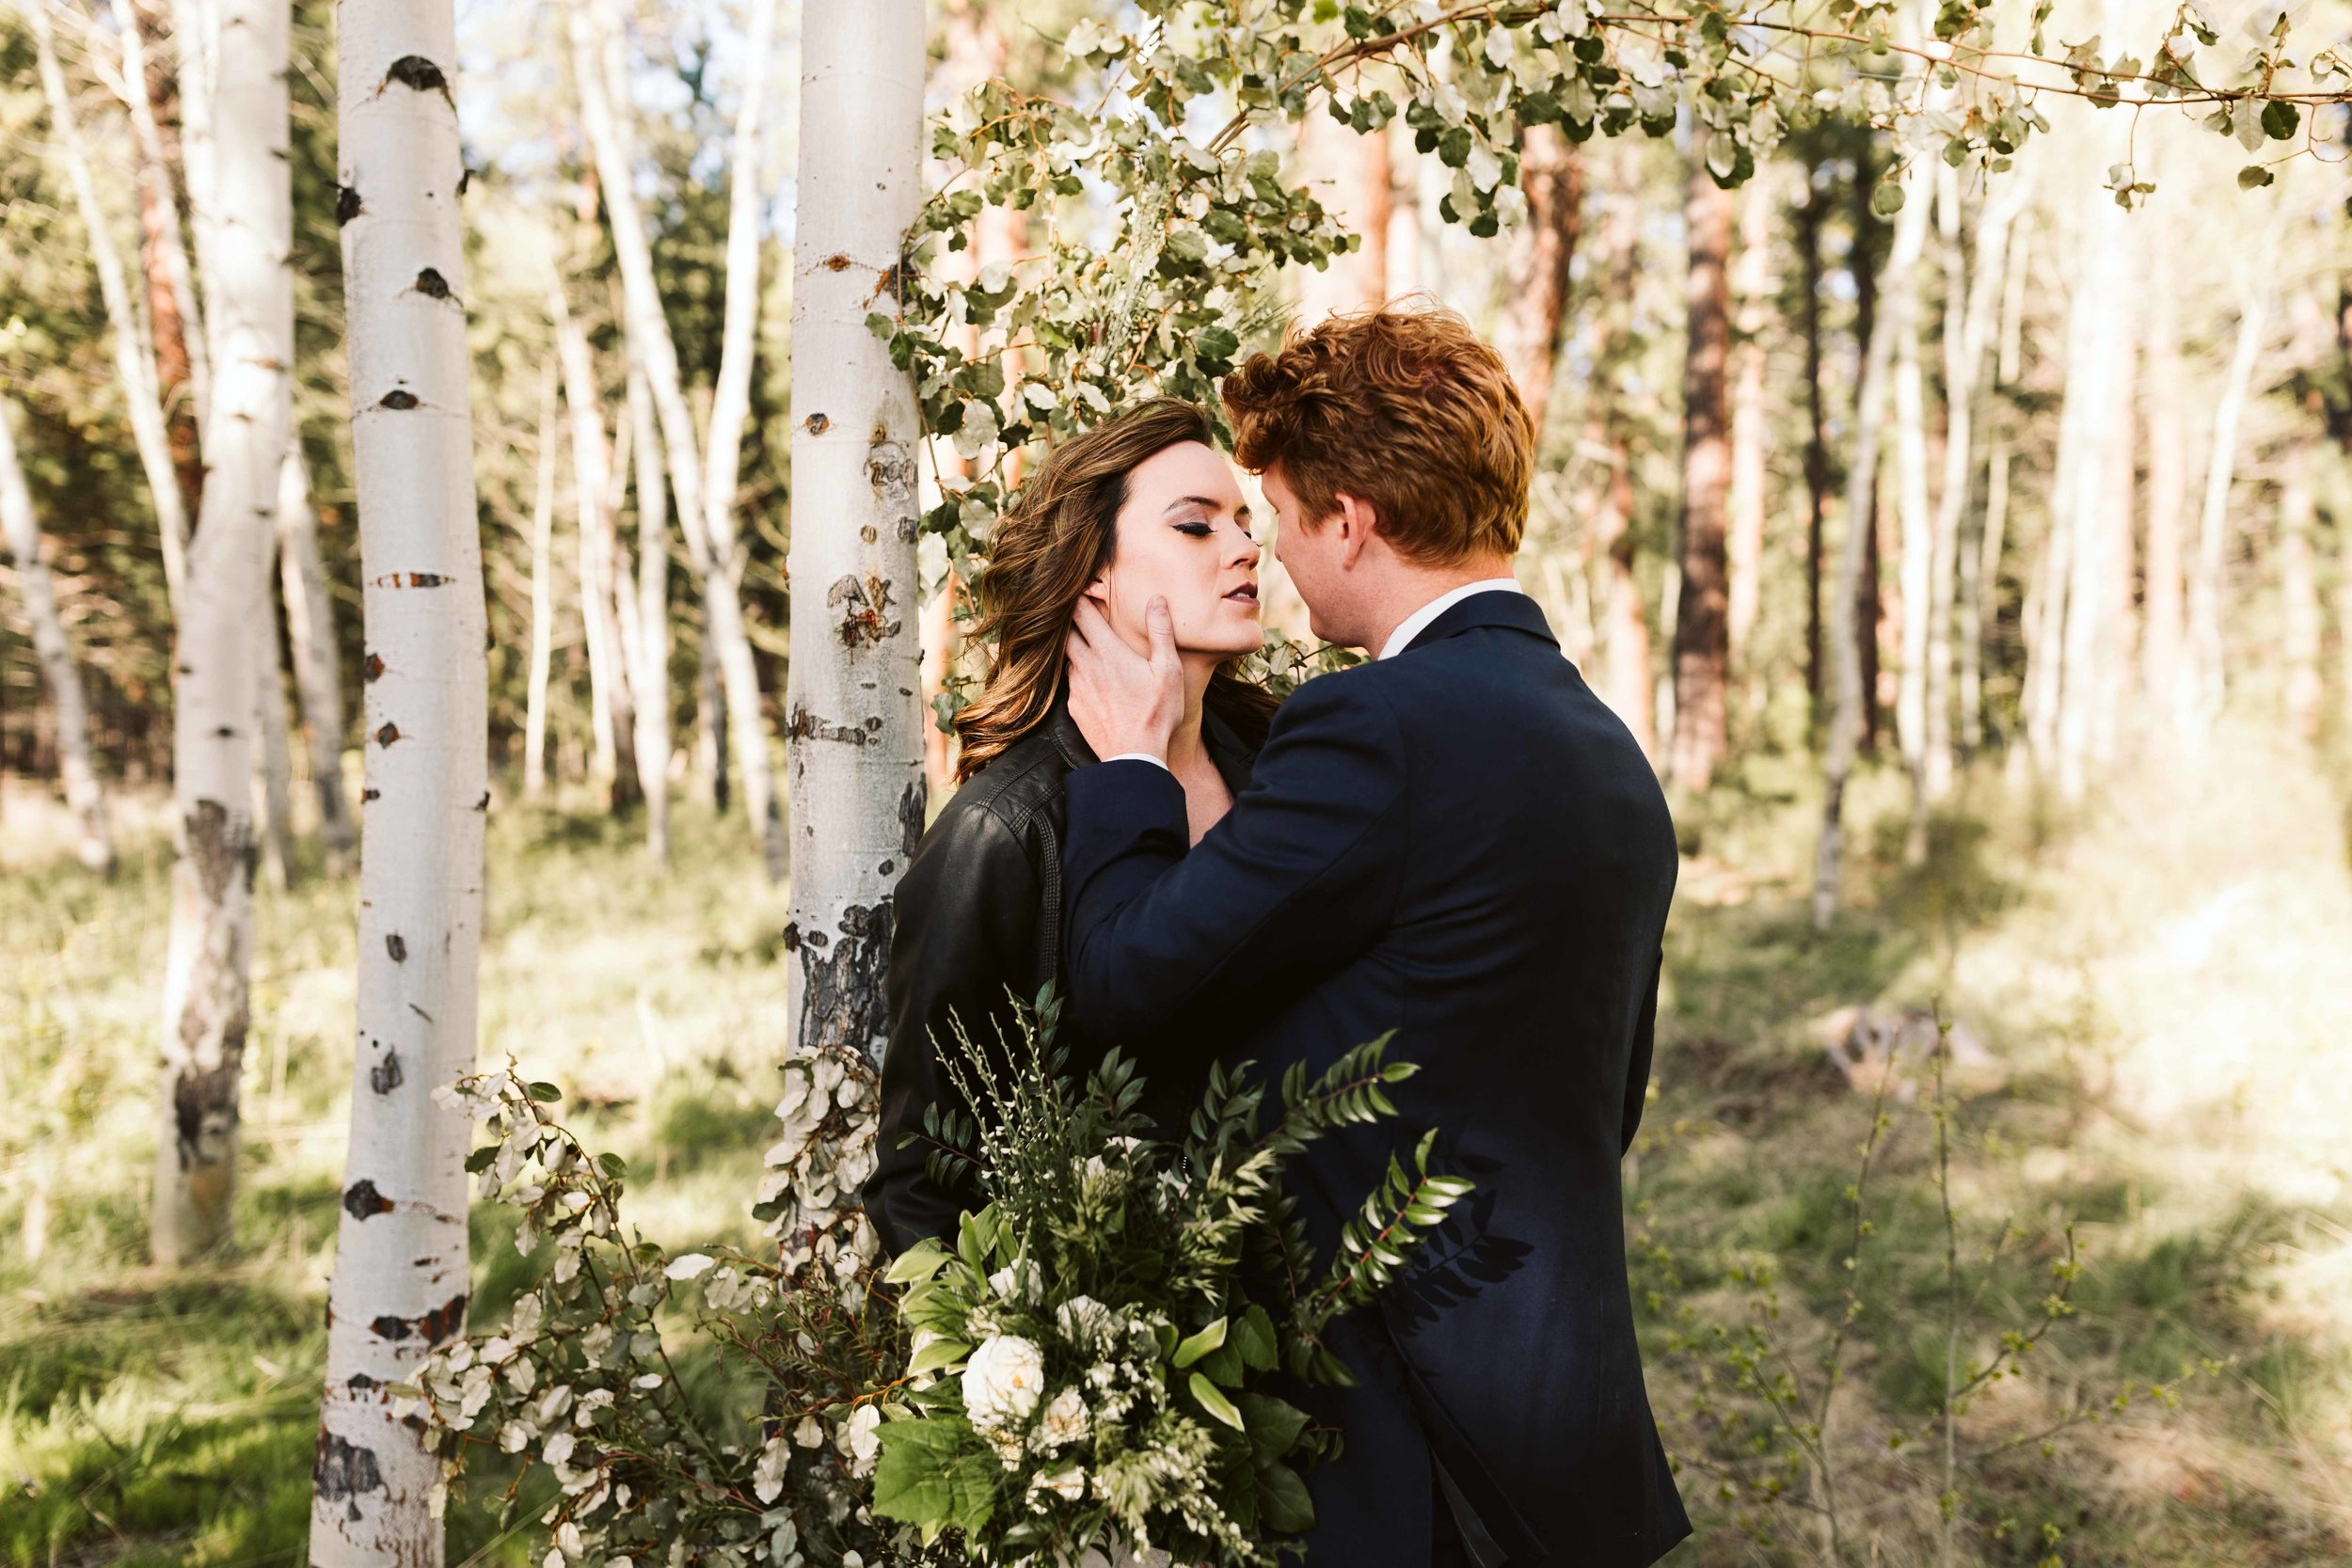 bend-oregon-wedding-photographer-69.jpg